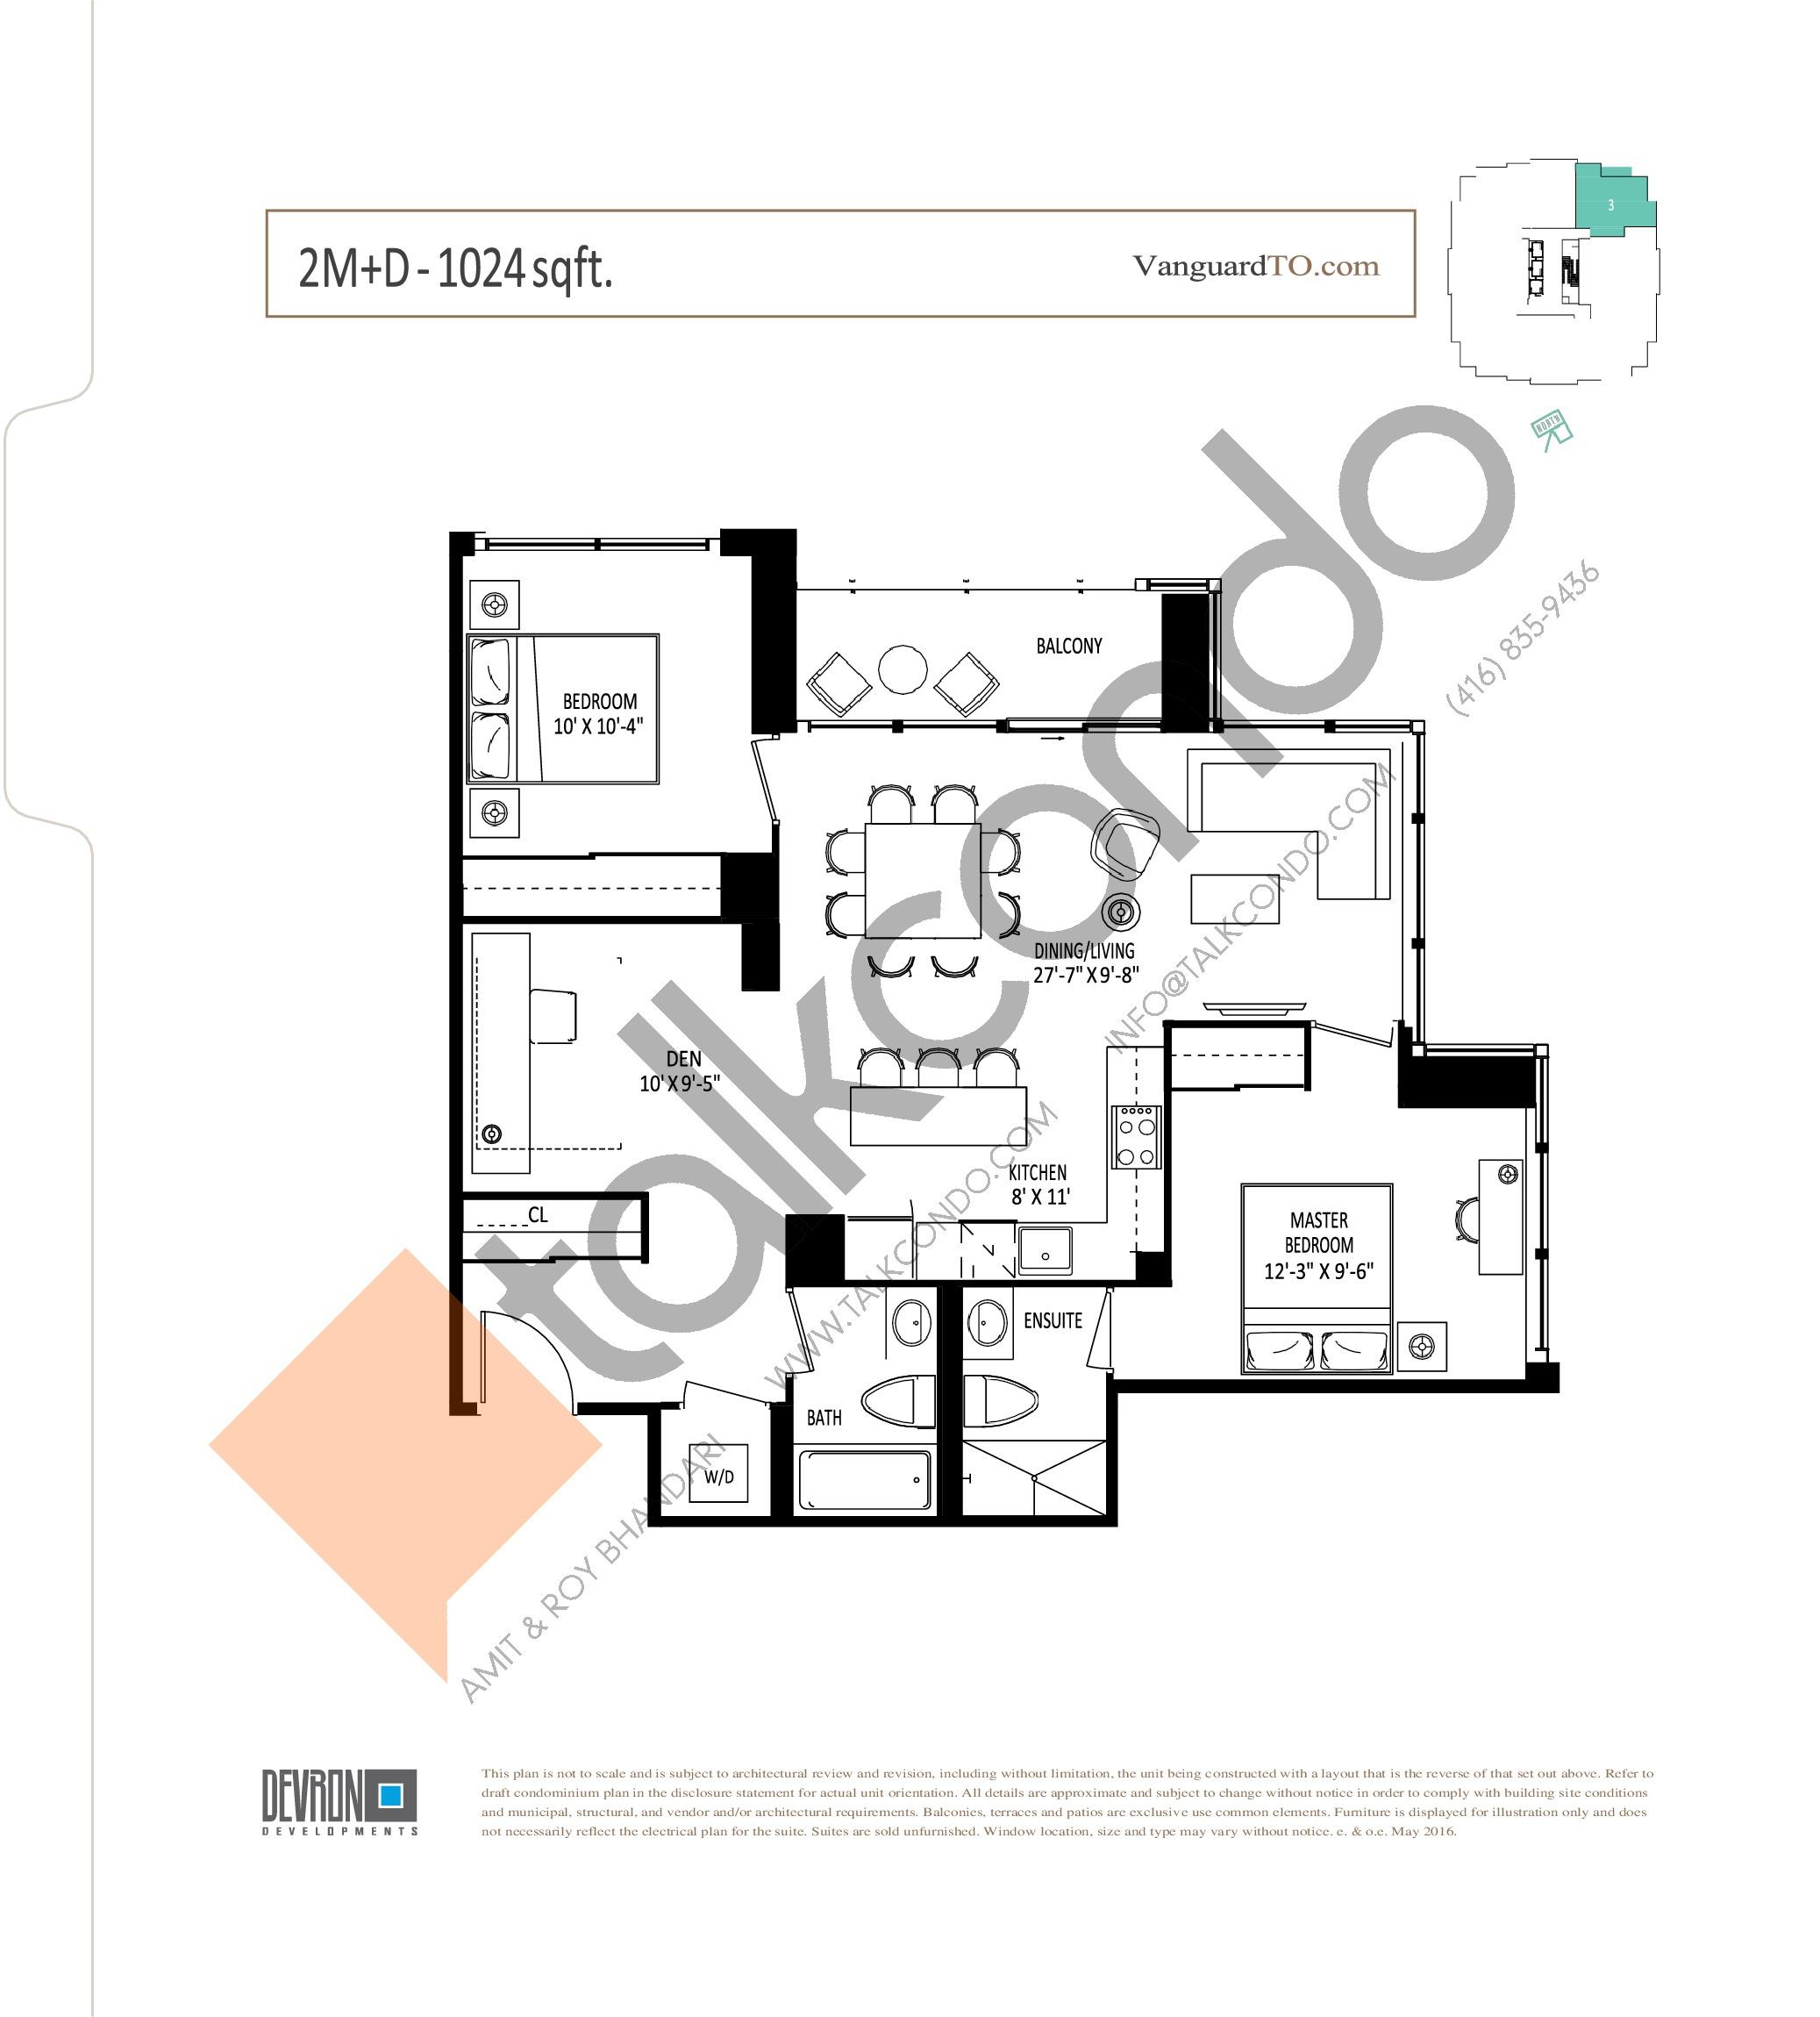 2M+D Floor Plan at The Vanguard - 1024 sq.ft